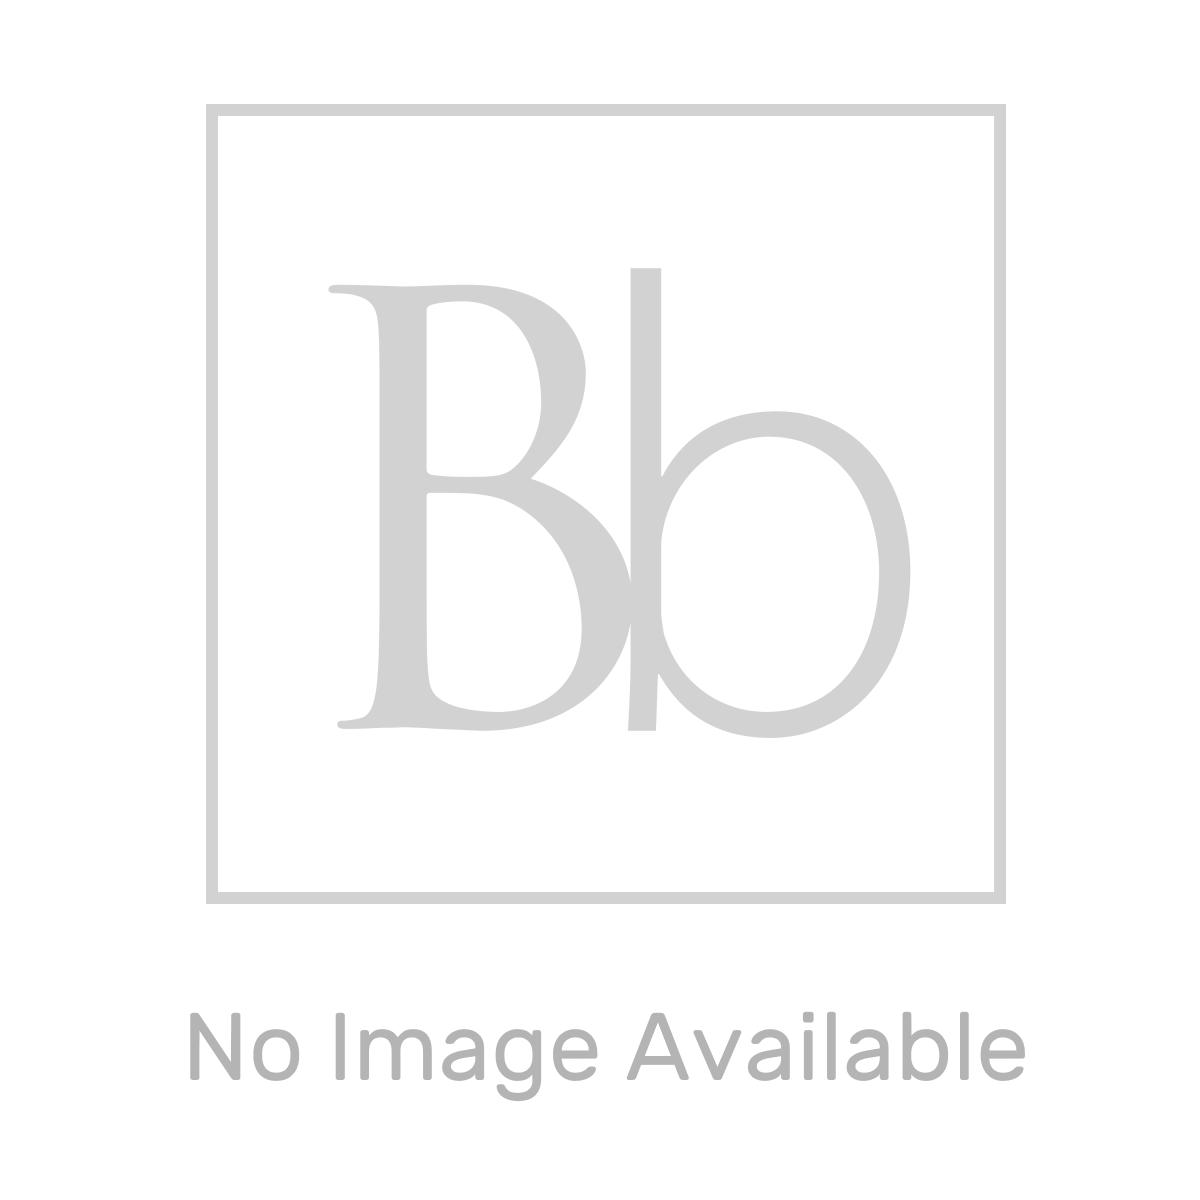 Aquadart Black Slate Shower Tray 1100 x 800 Dimension